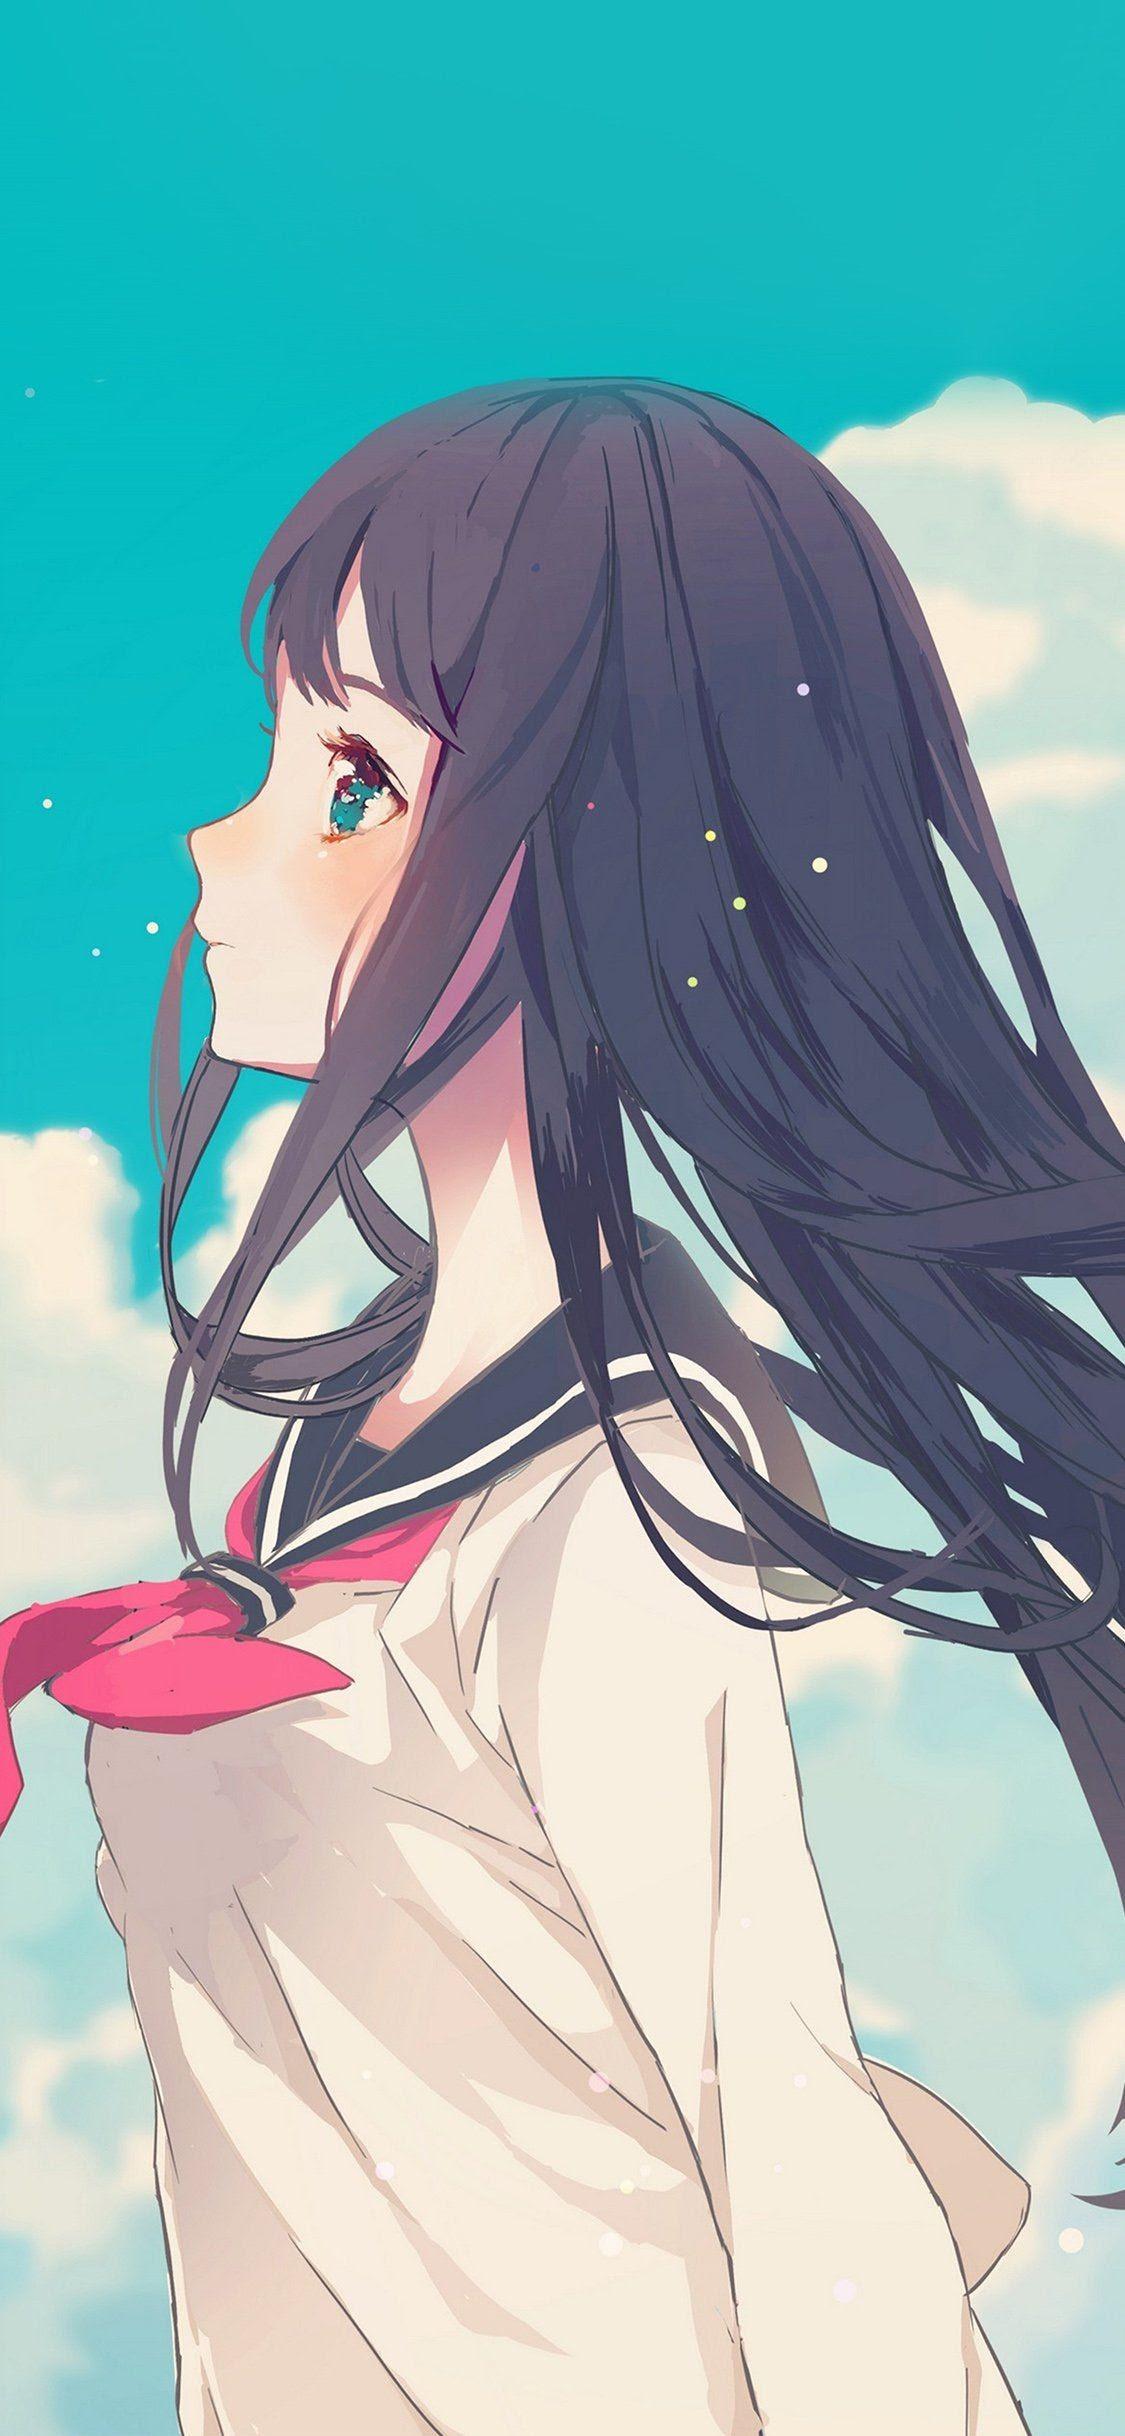 Cute Aesthetic Anime Wallpaper Phone Largest Wallpaper Portal